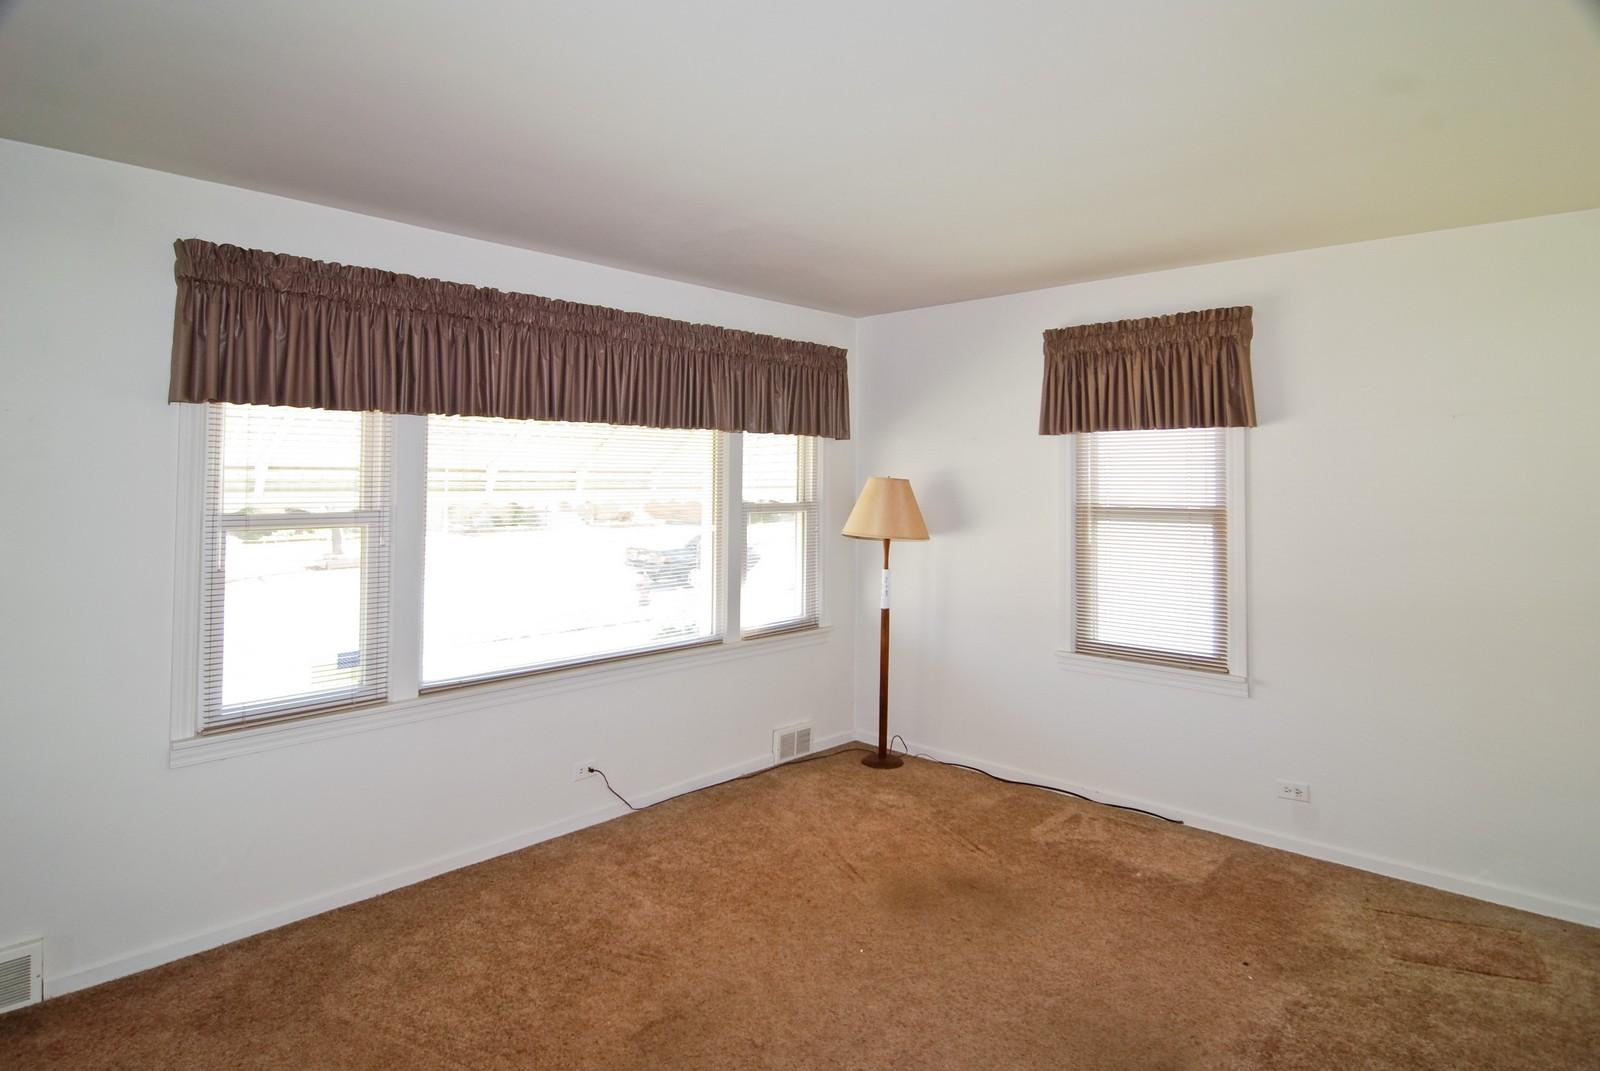 Real Estate Photography - 1526 Hillside Ave, Berkeley, IL, 60163 - Living Room